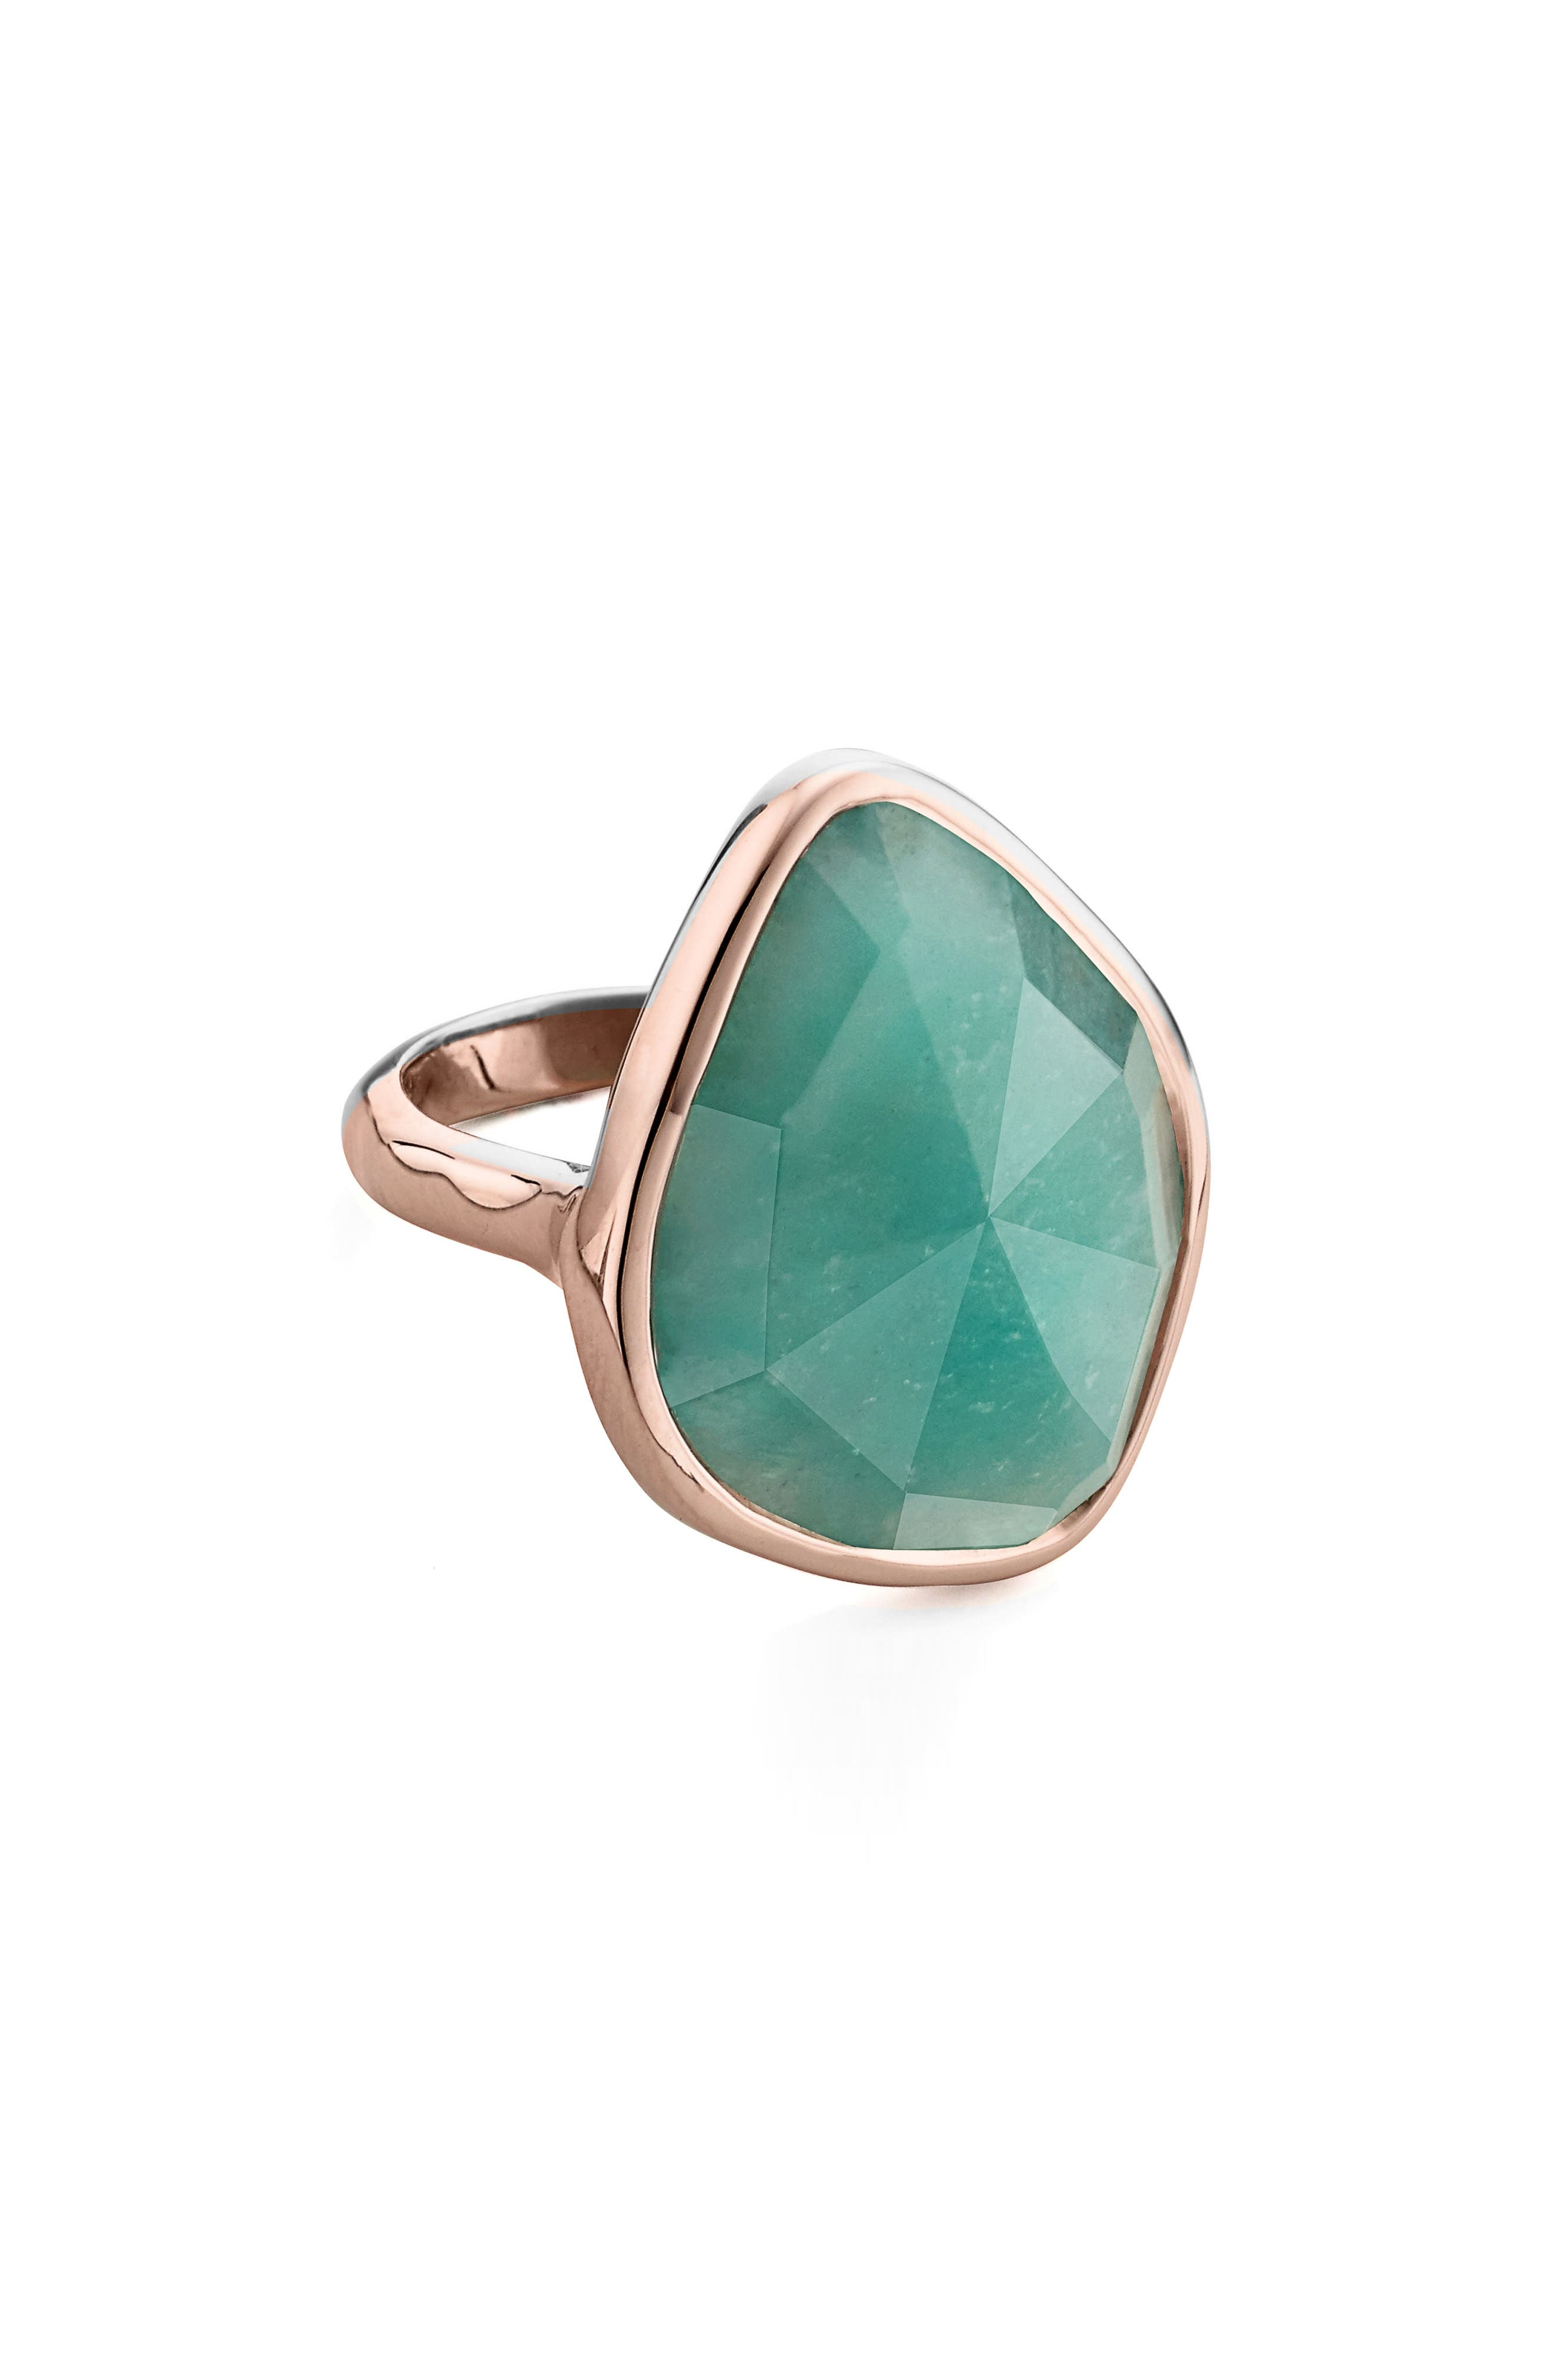 MONICA VINADER, Siren Nugget Semiprecious Stone Cocktail Ring, Main thumbnail 1, color, ROSE GOLD/ AMAZONITE